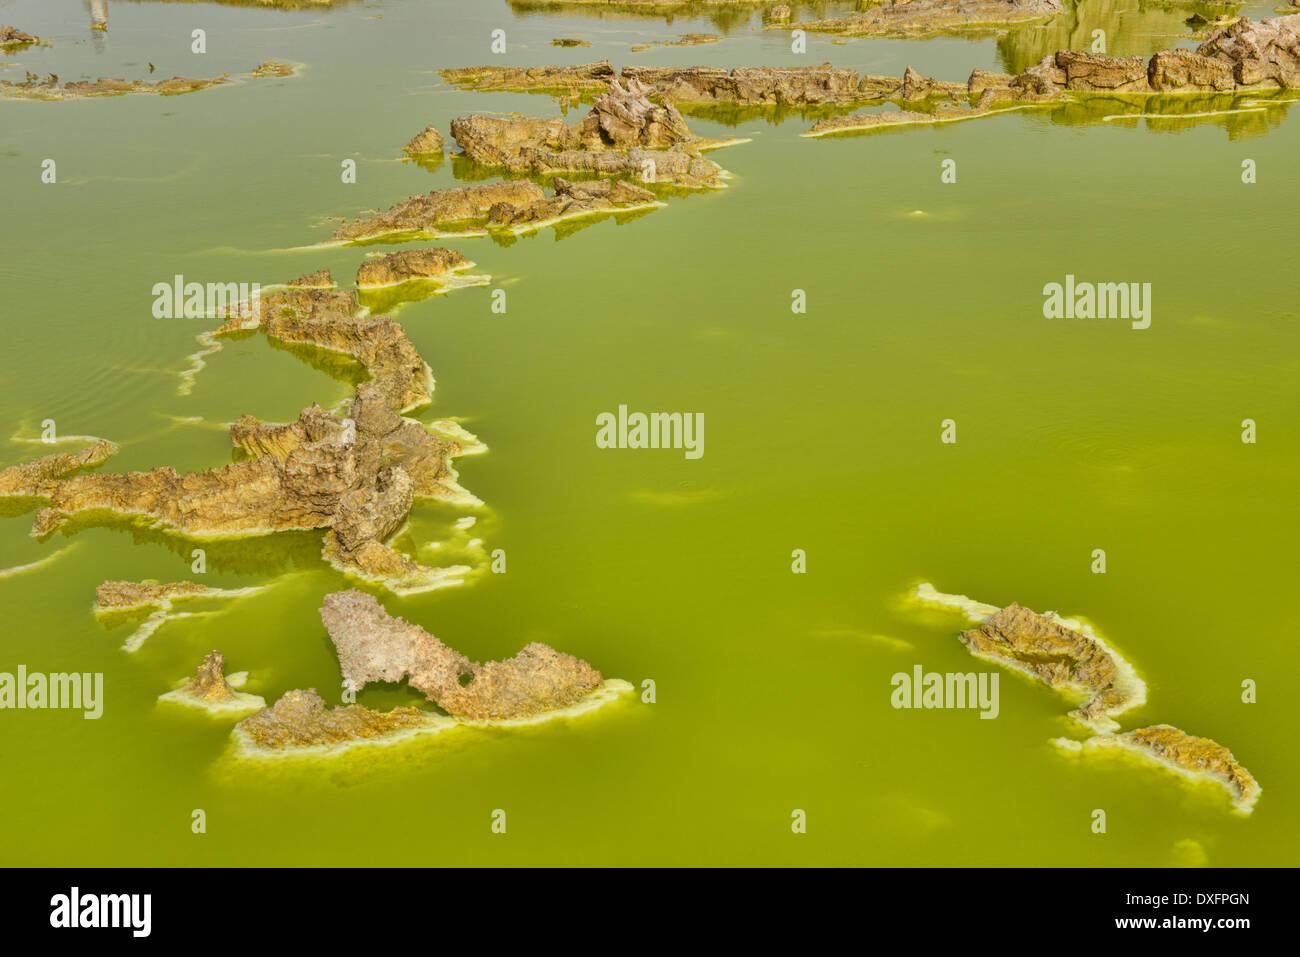 The surreal volcanic landscape of Dallol in the Danakil Depression, Ethiopia - Stock Image